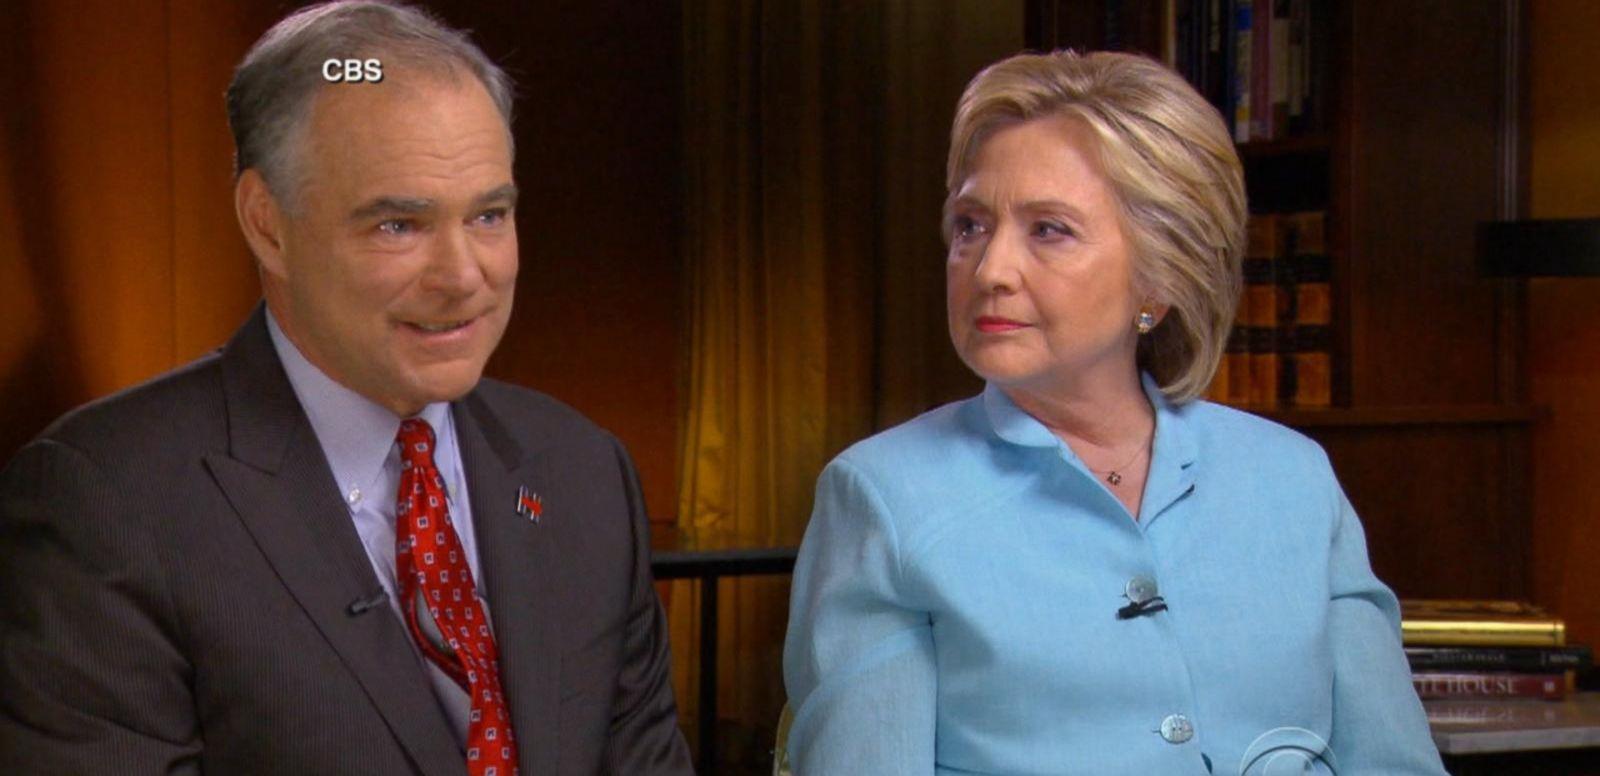 VIDEO: Hillary Clinton, Tim Kaine Rally Against Donald Trump